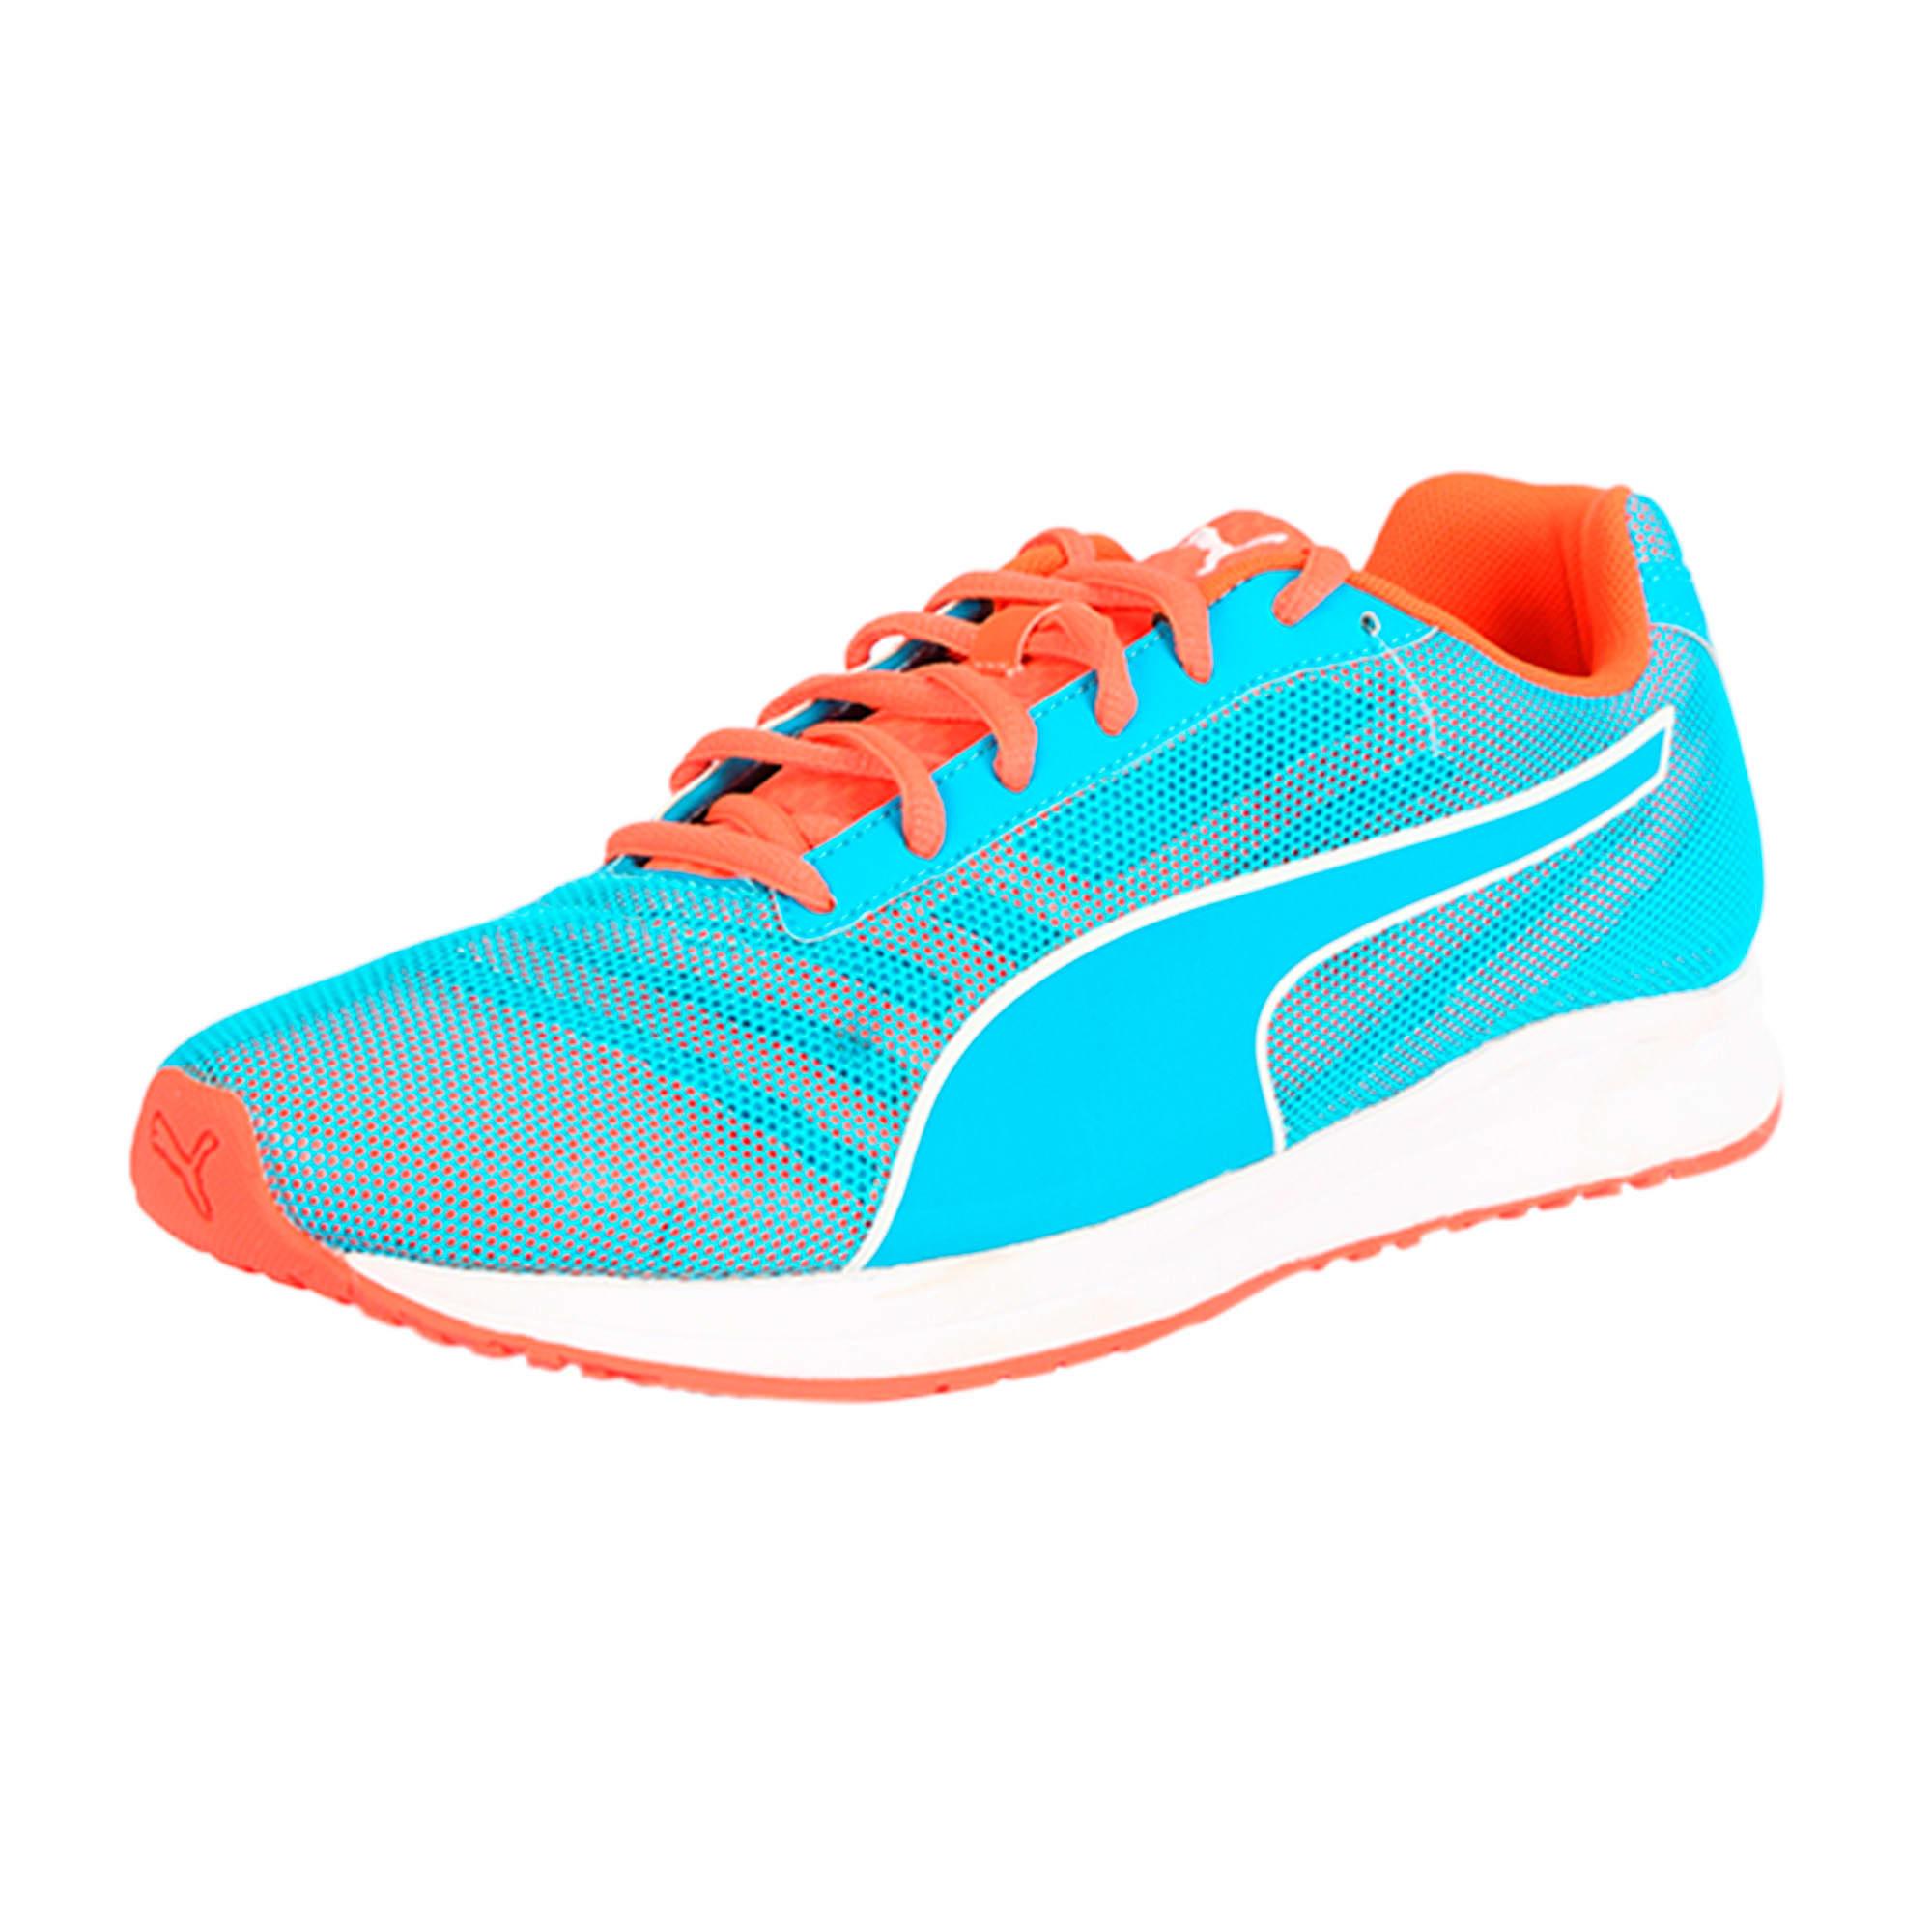 Thumbnail 1 of Burst Running Shoes, atomic blue-red blast, medium-IND